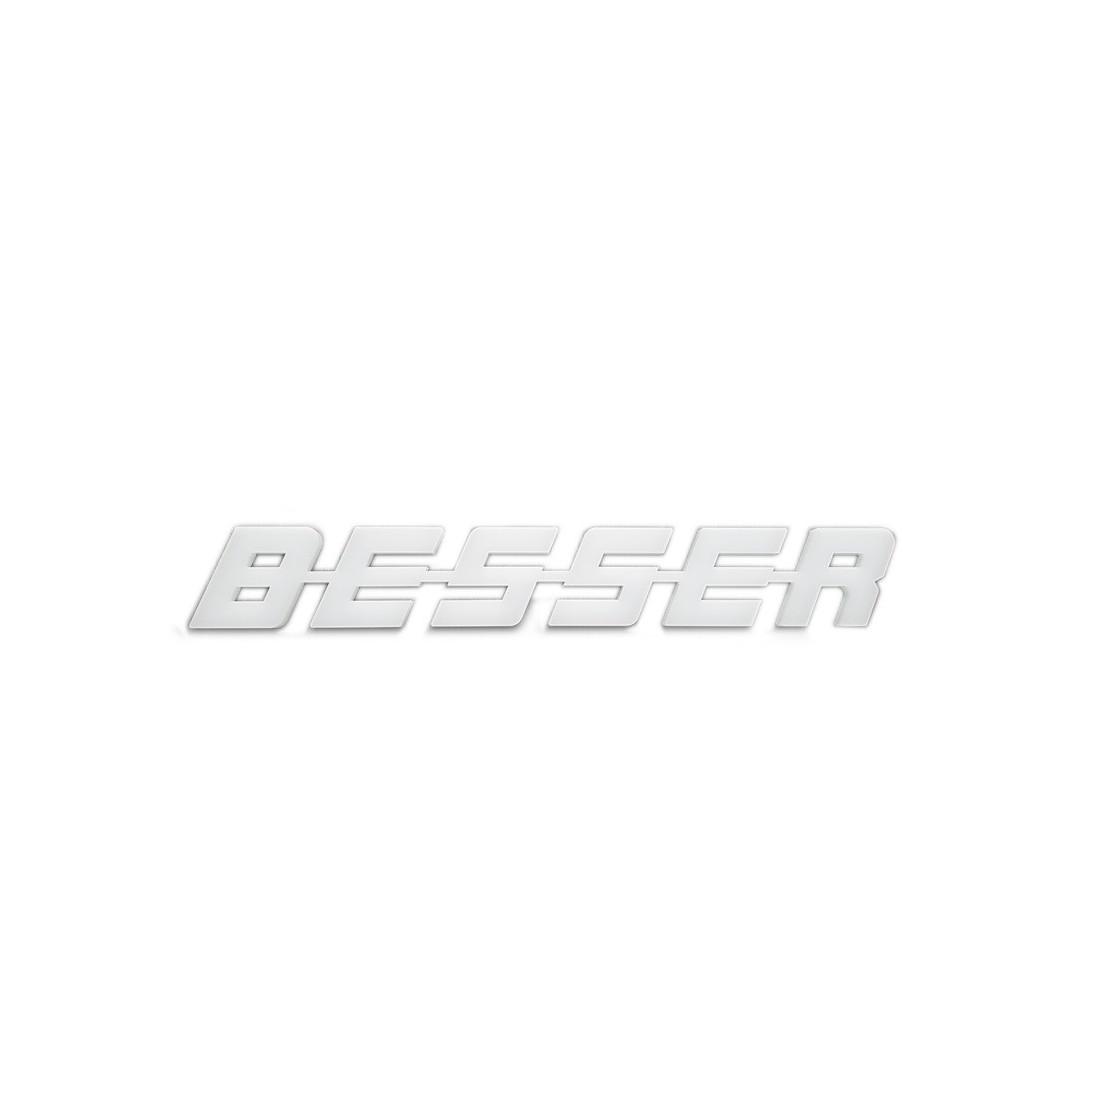 BESSER plastic emblem letters logo